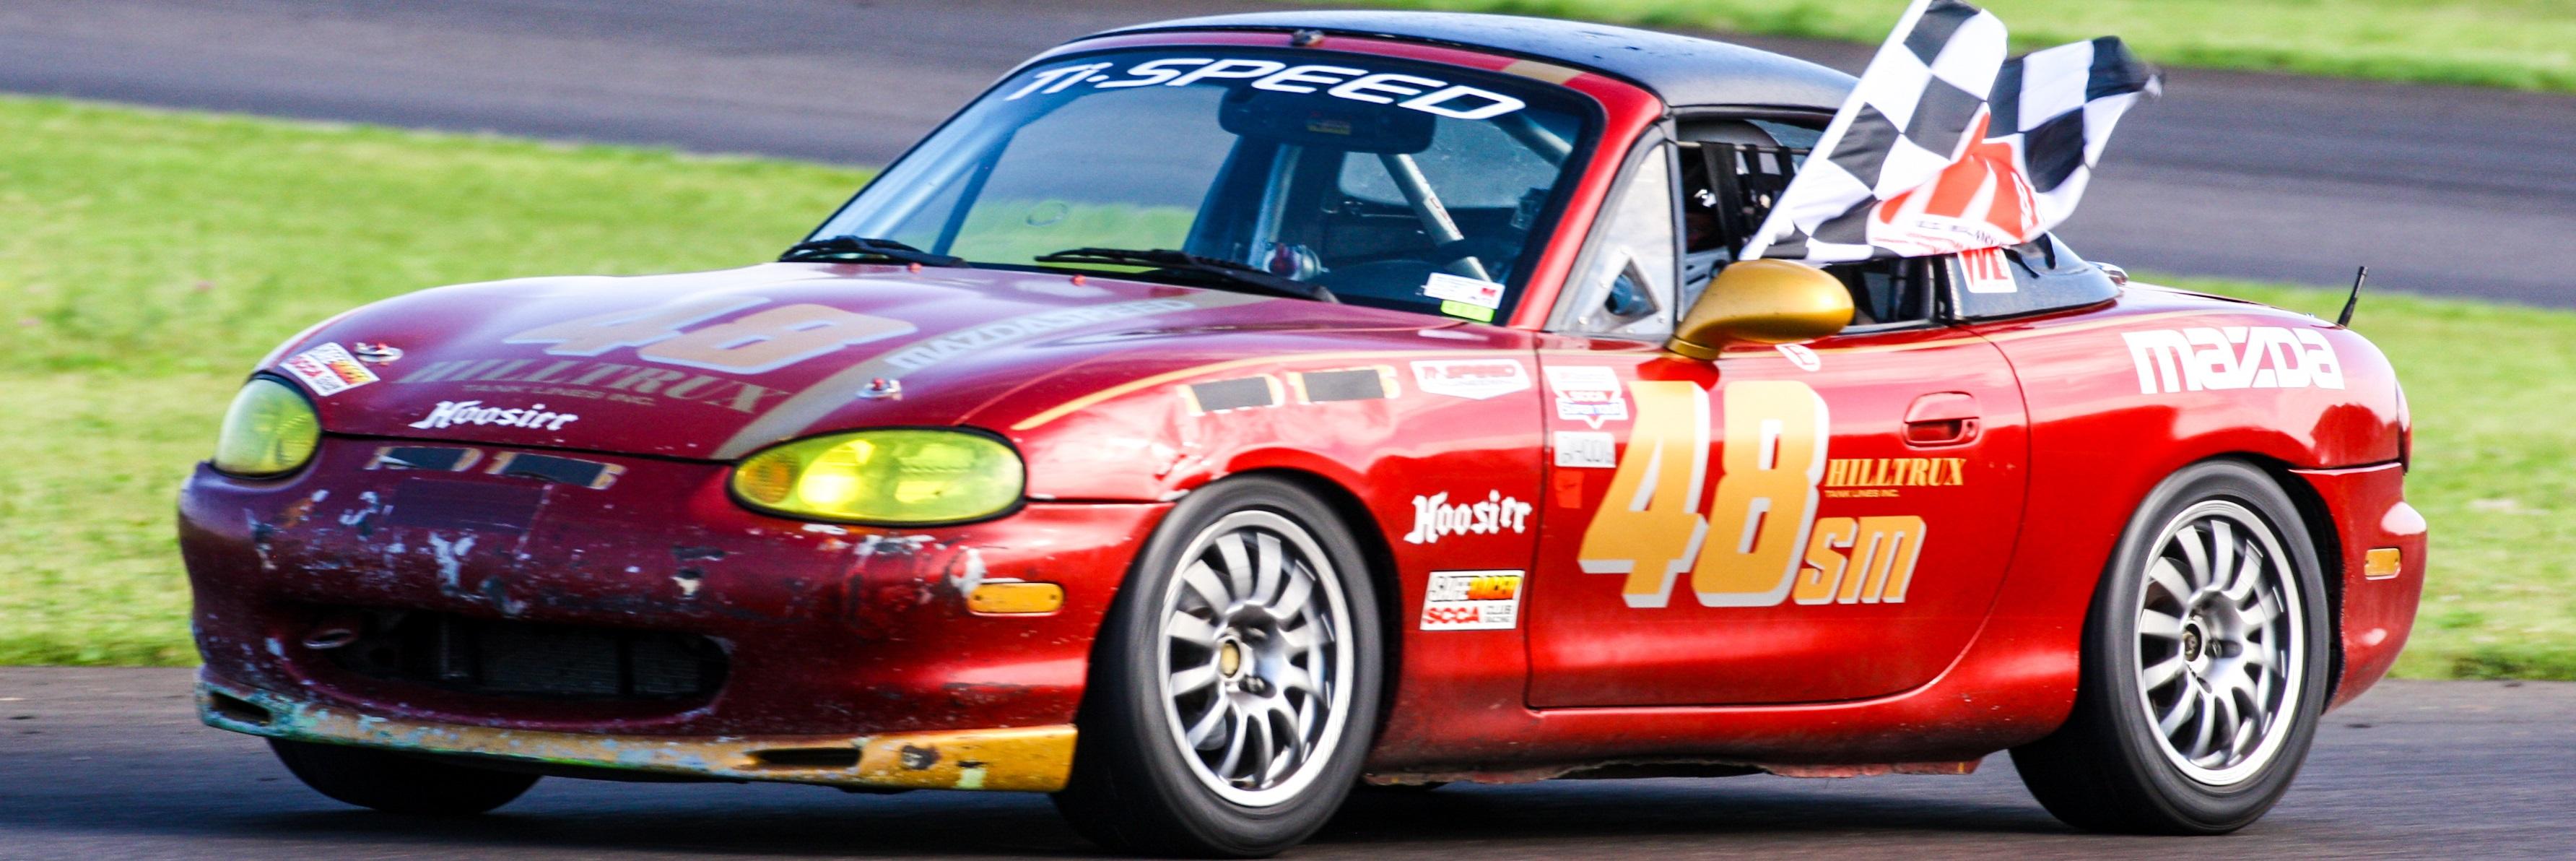 Registration open for Spring Sprints at Gingerman Raceway